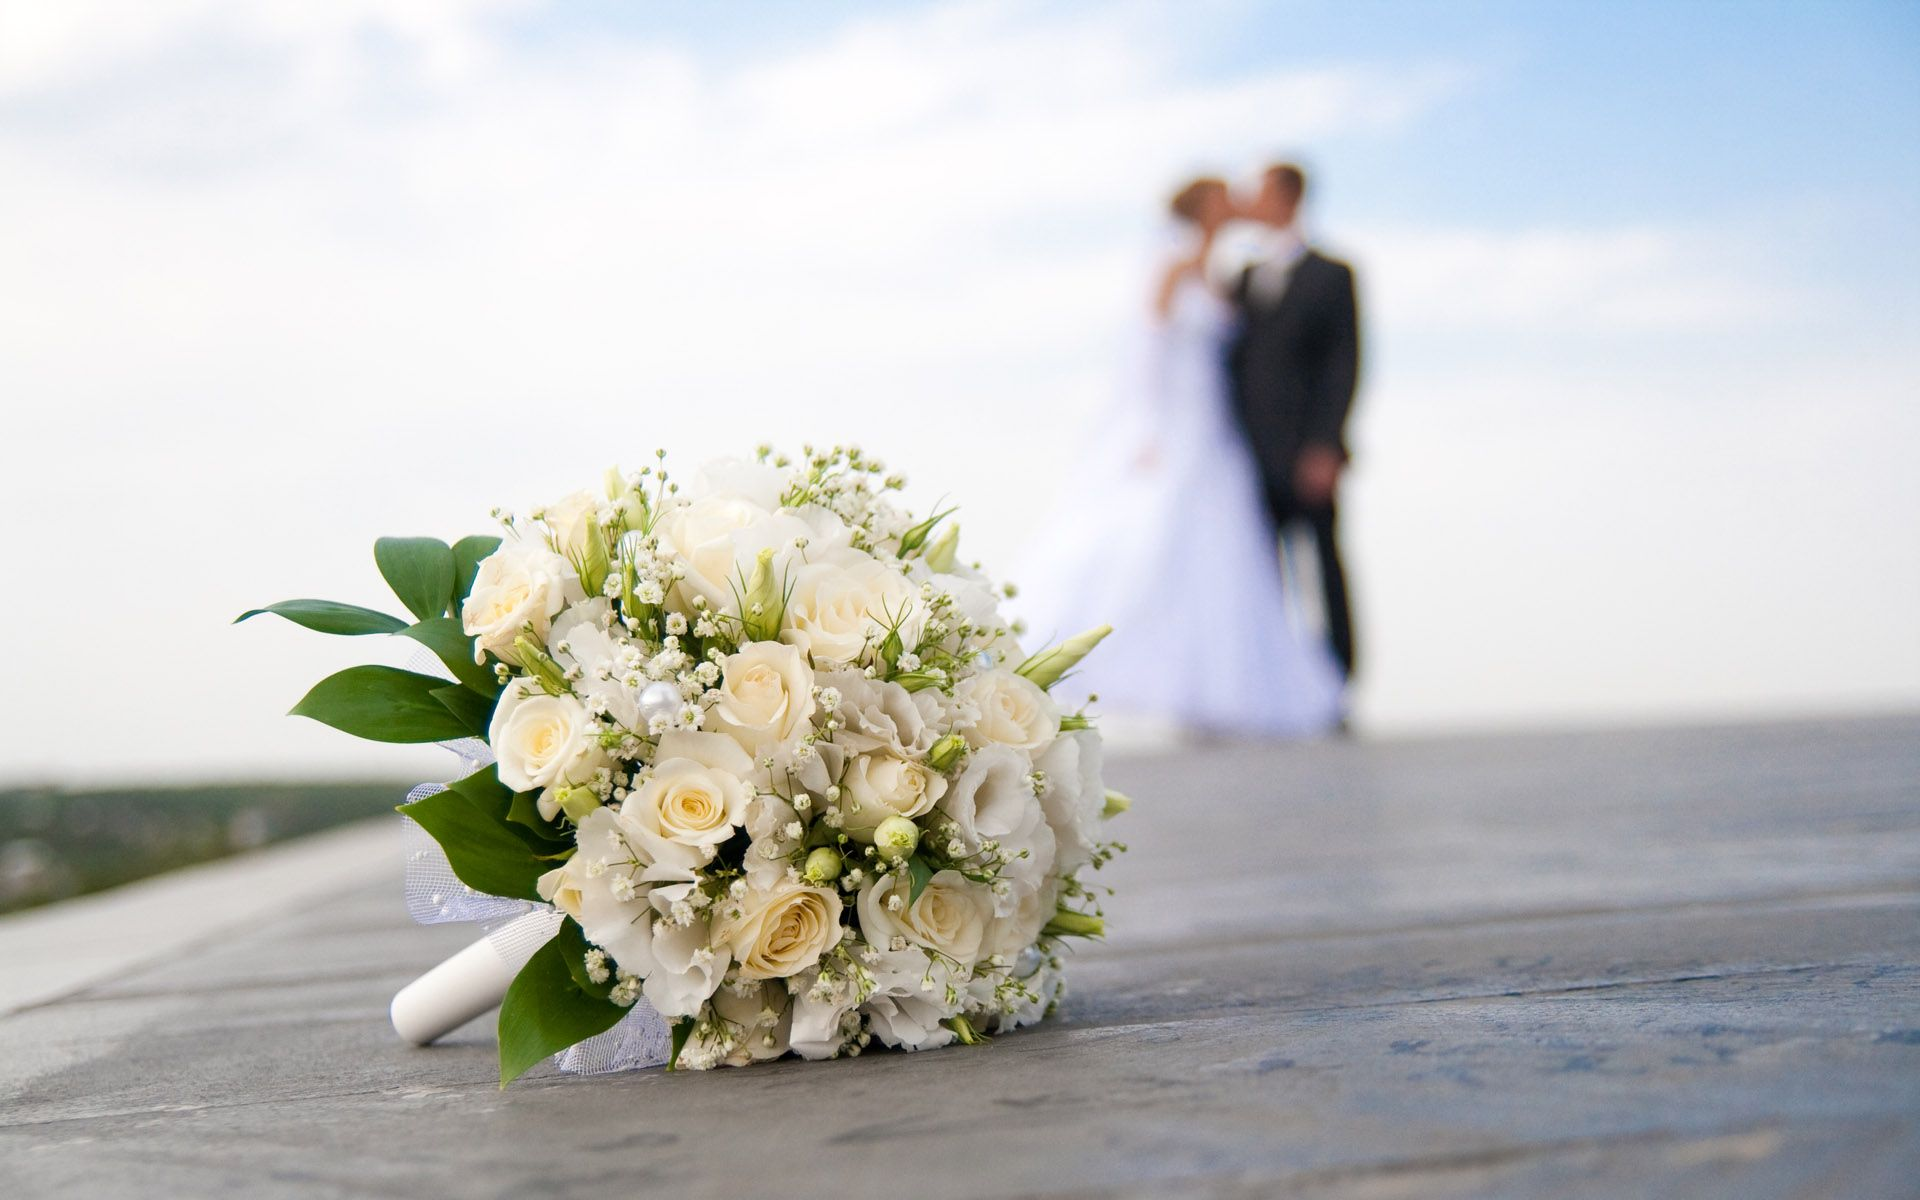 Unique ideas for your Greek wedding - Protelia